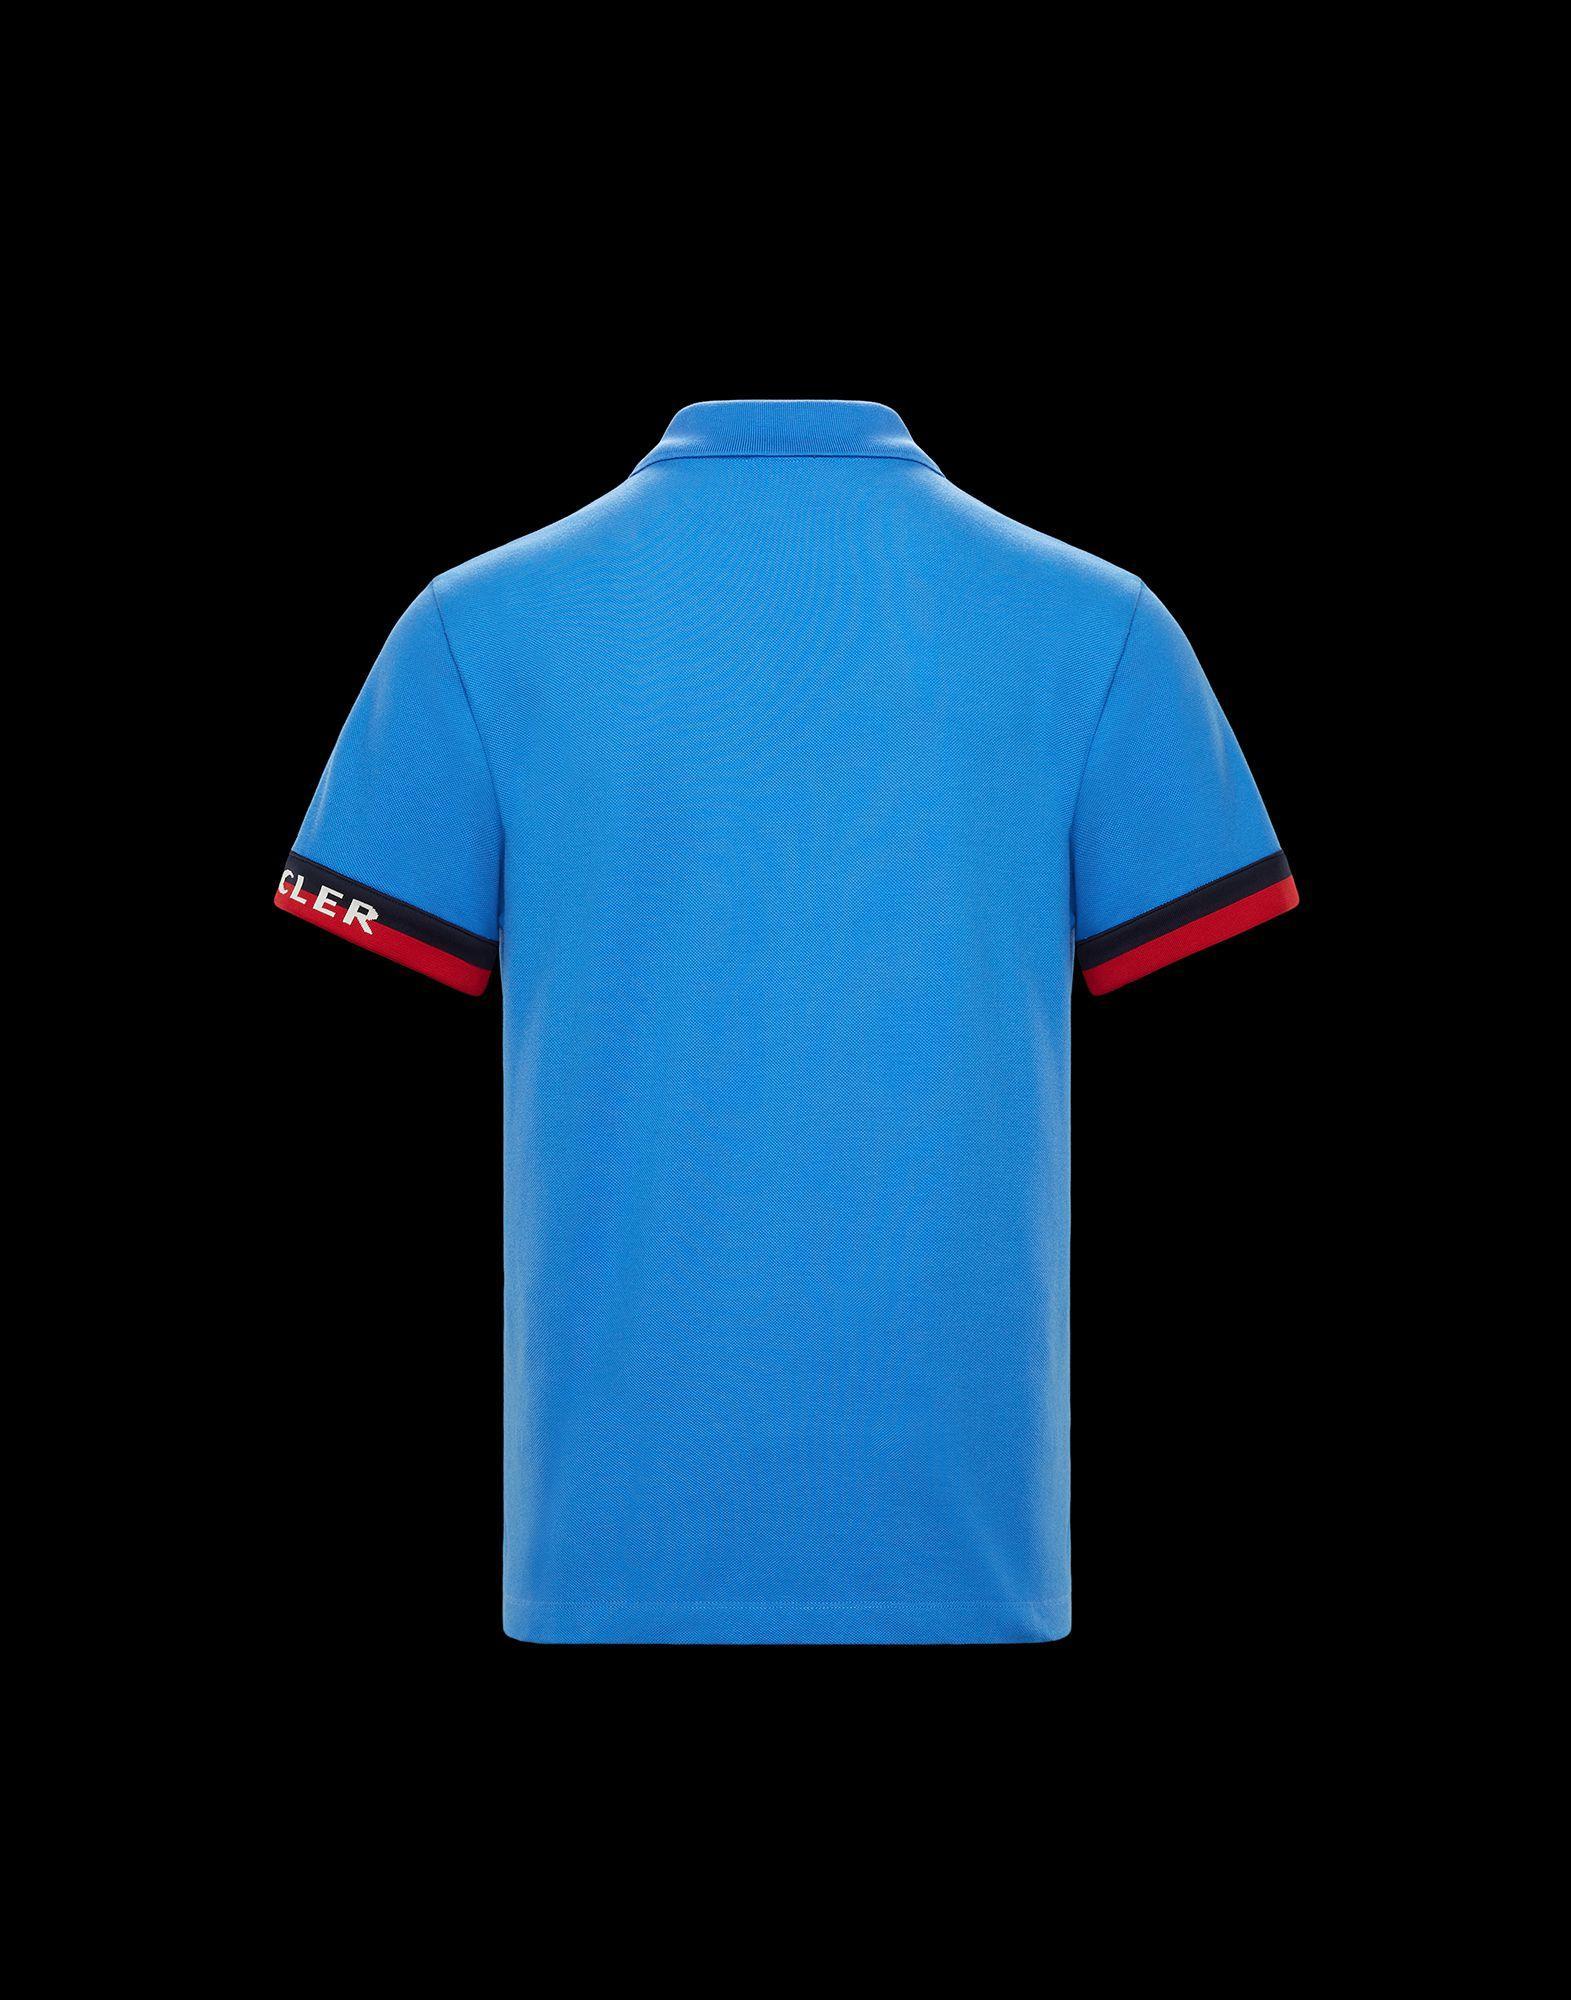 795149770067d Moncler - Blue Polo for Men - Lyst. View fullscreen